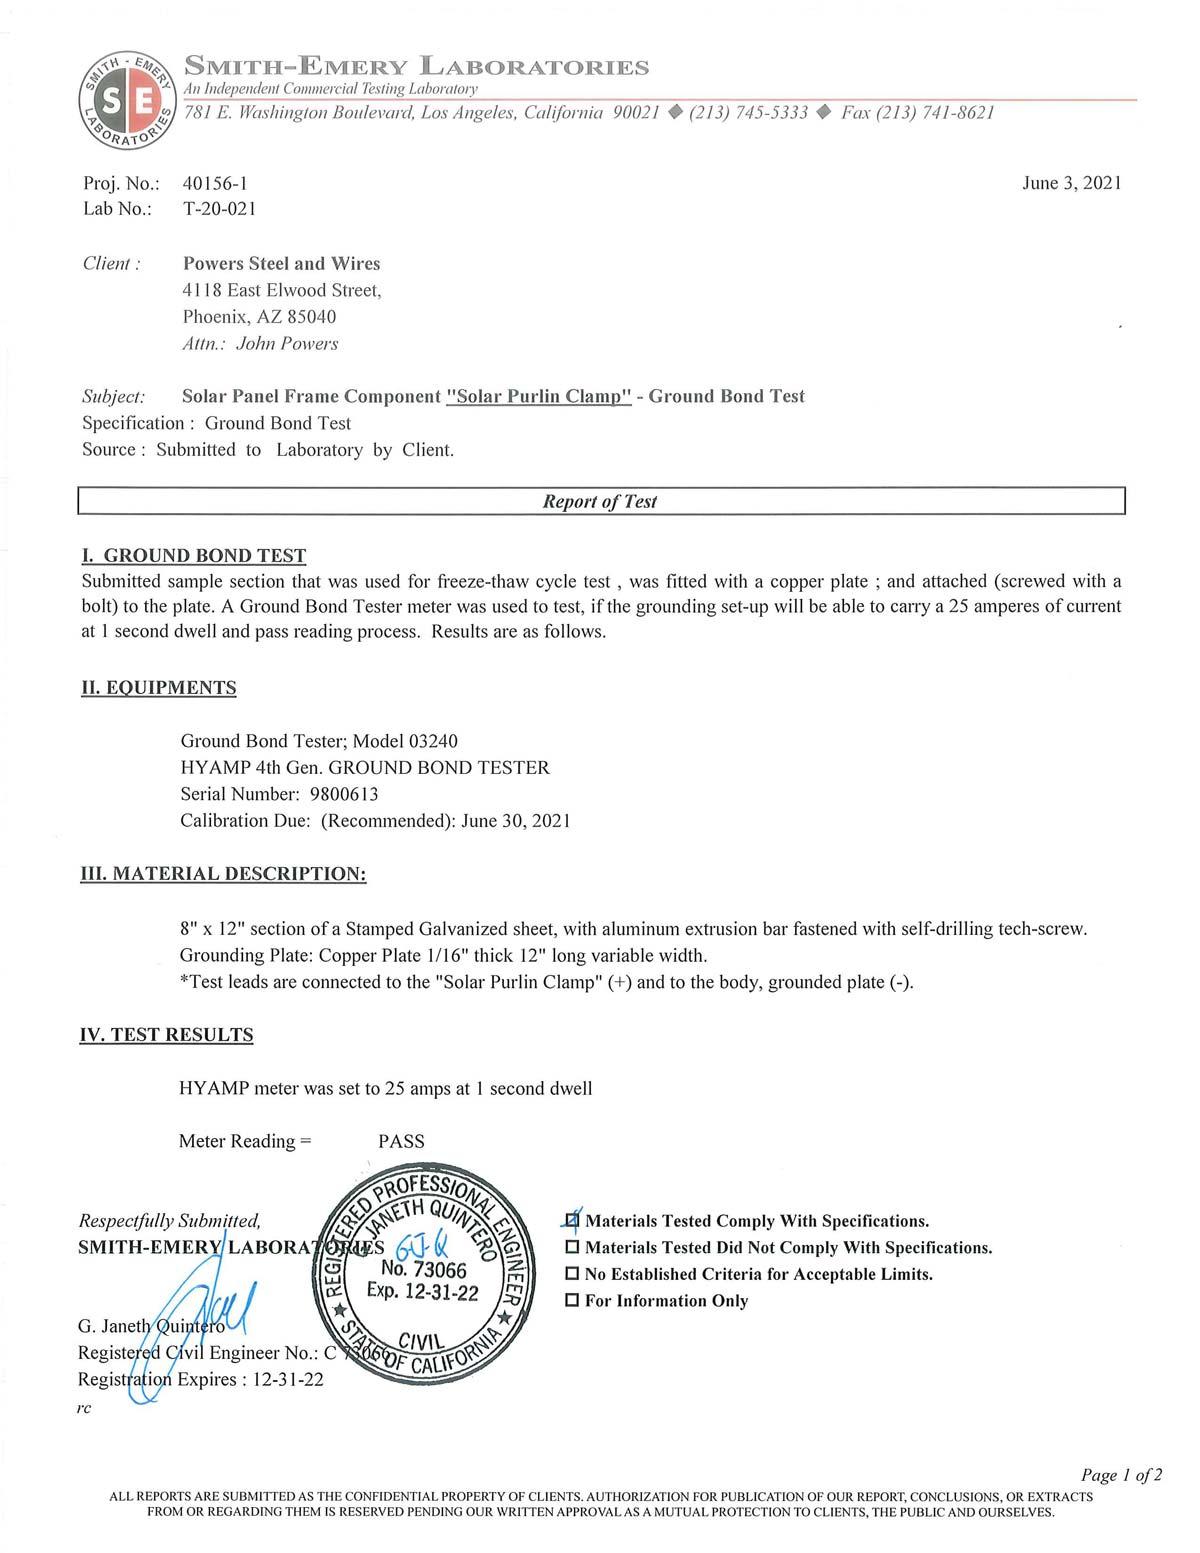 Mini Clip Ground Bond Certification page 1